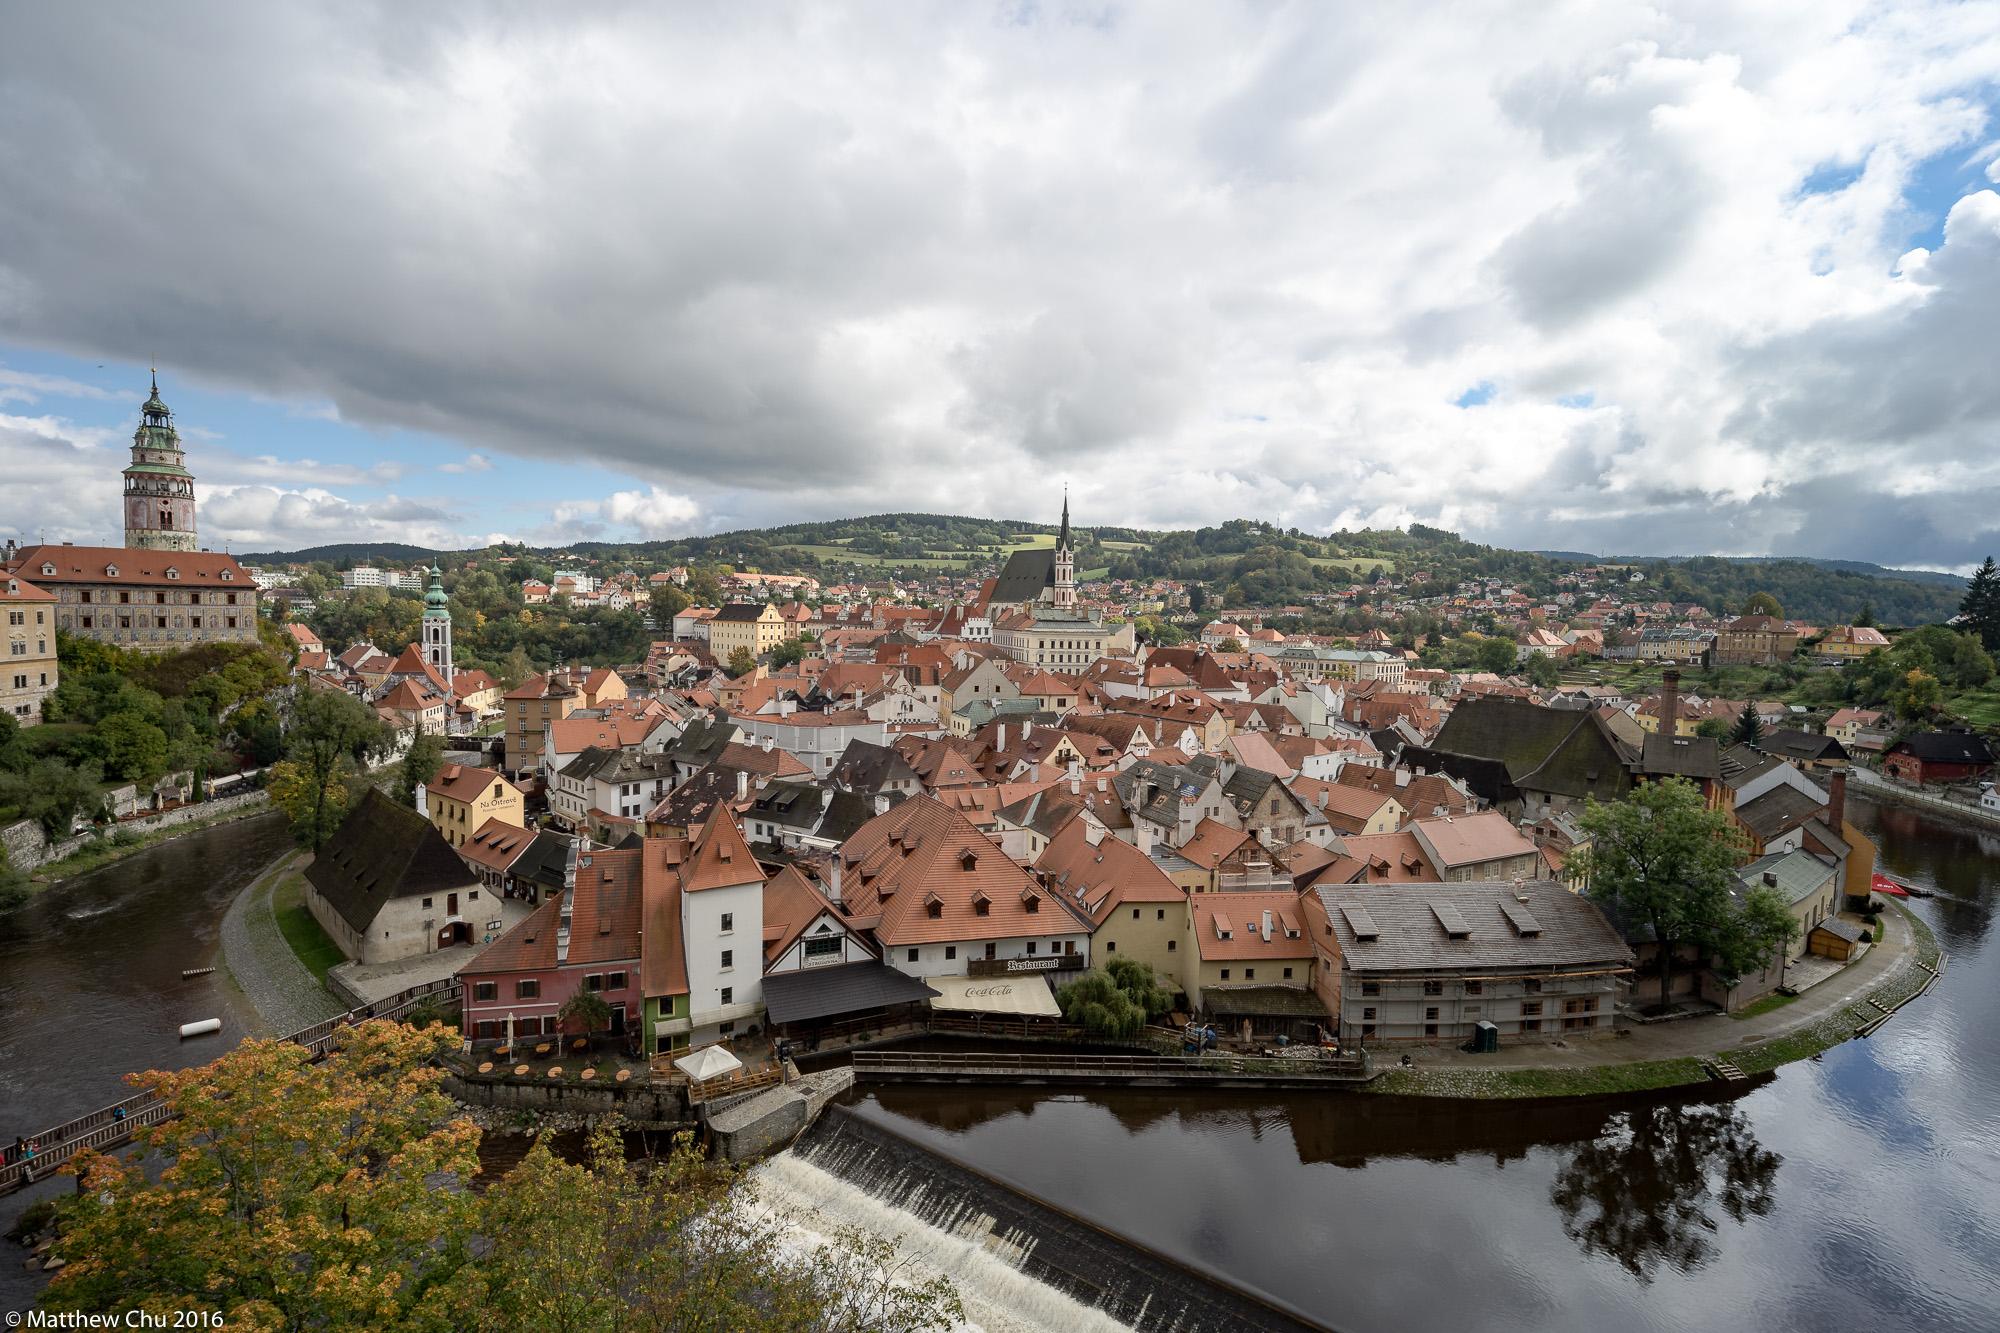 View of Cesky Krumlov from Plastovy Most, Cesky Krumlov, Czech Republic